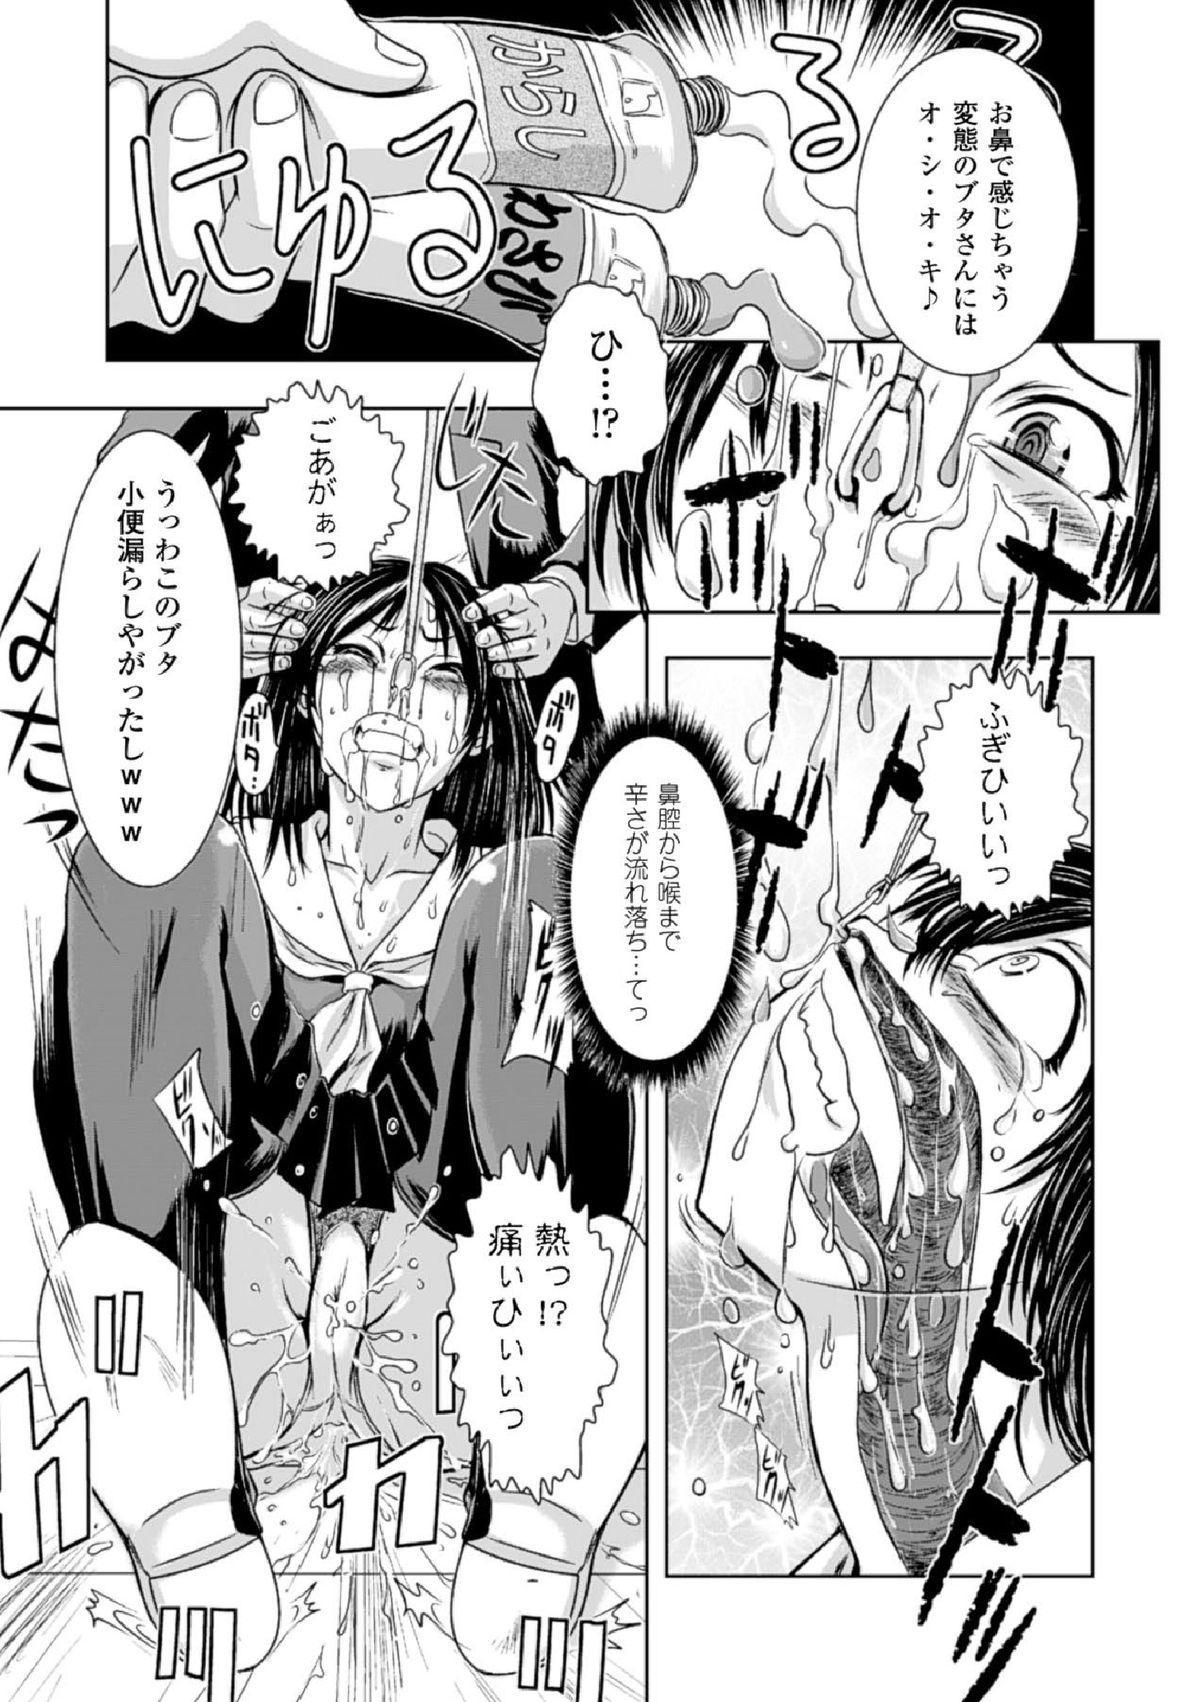 Haiboku Heroine Kaizou Choukyou Inferno 136